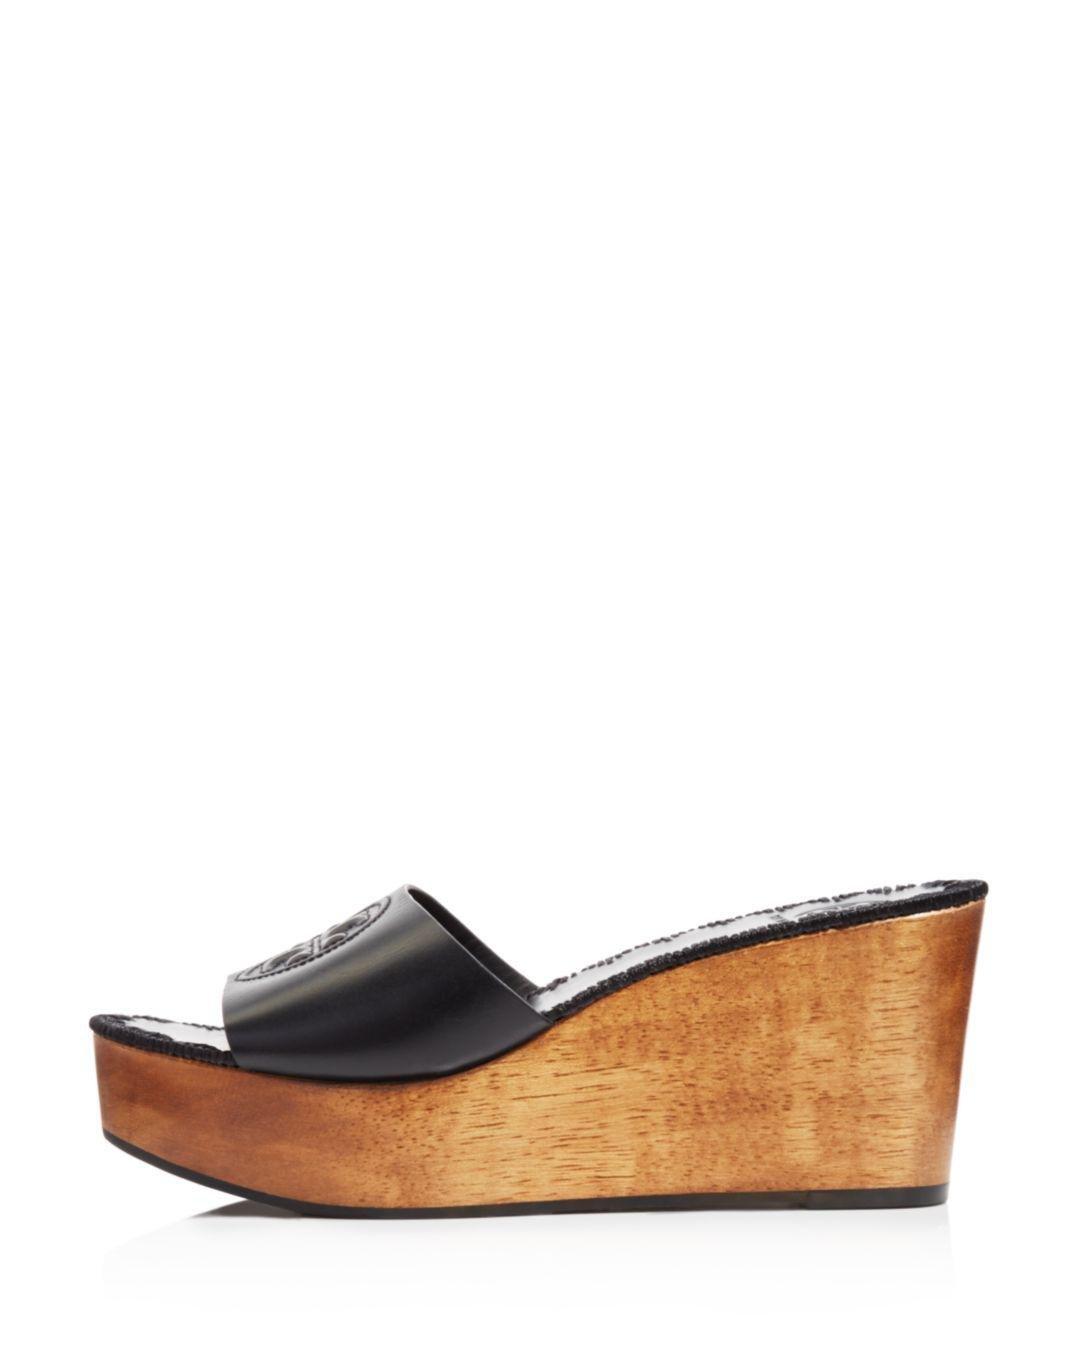 b46c9cd2f4f8 Lyst - Tory Burch Women s Patty Leather Platform Wedge Slide Sandals ...